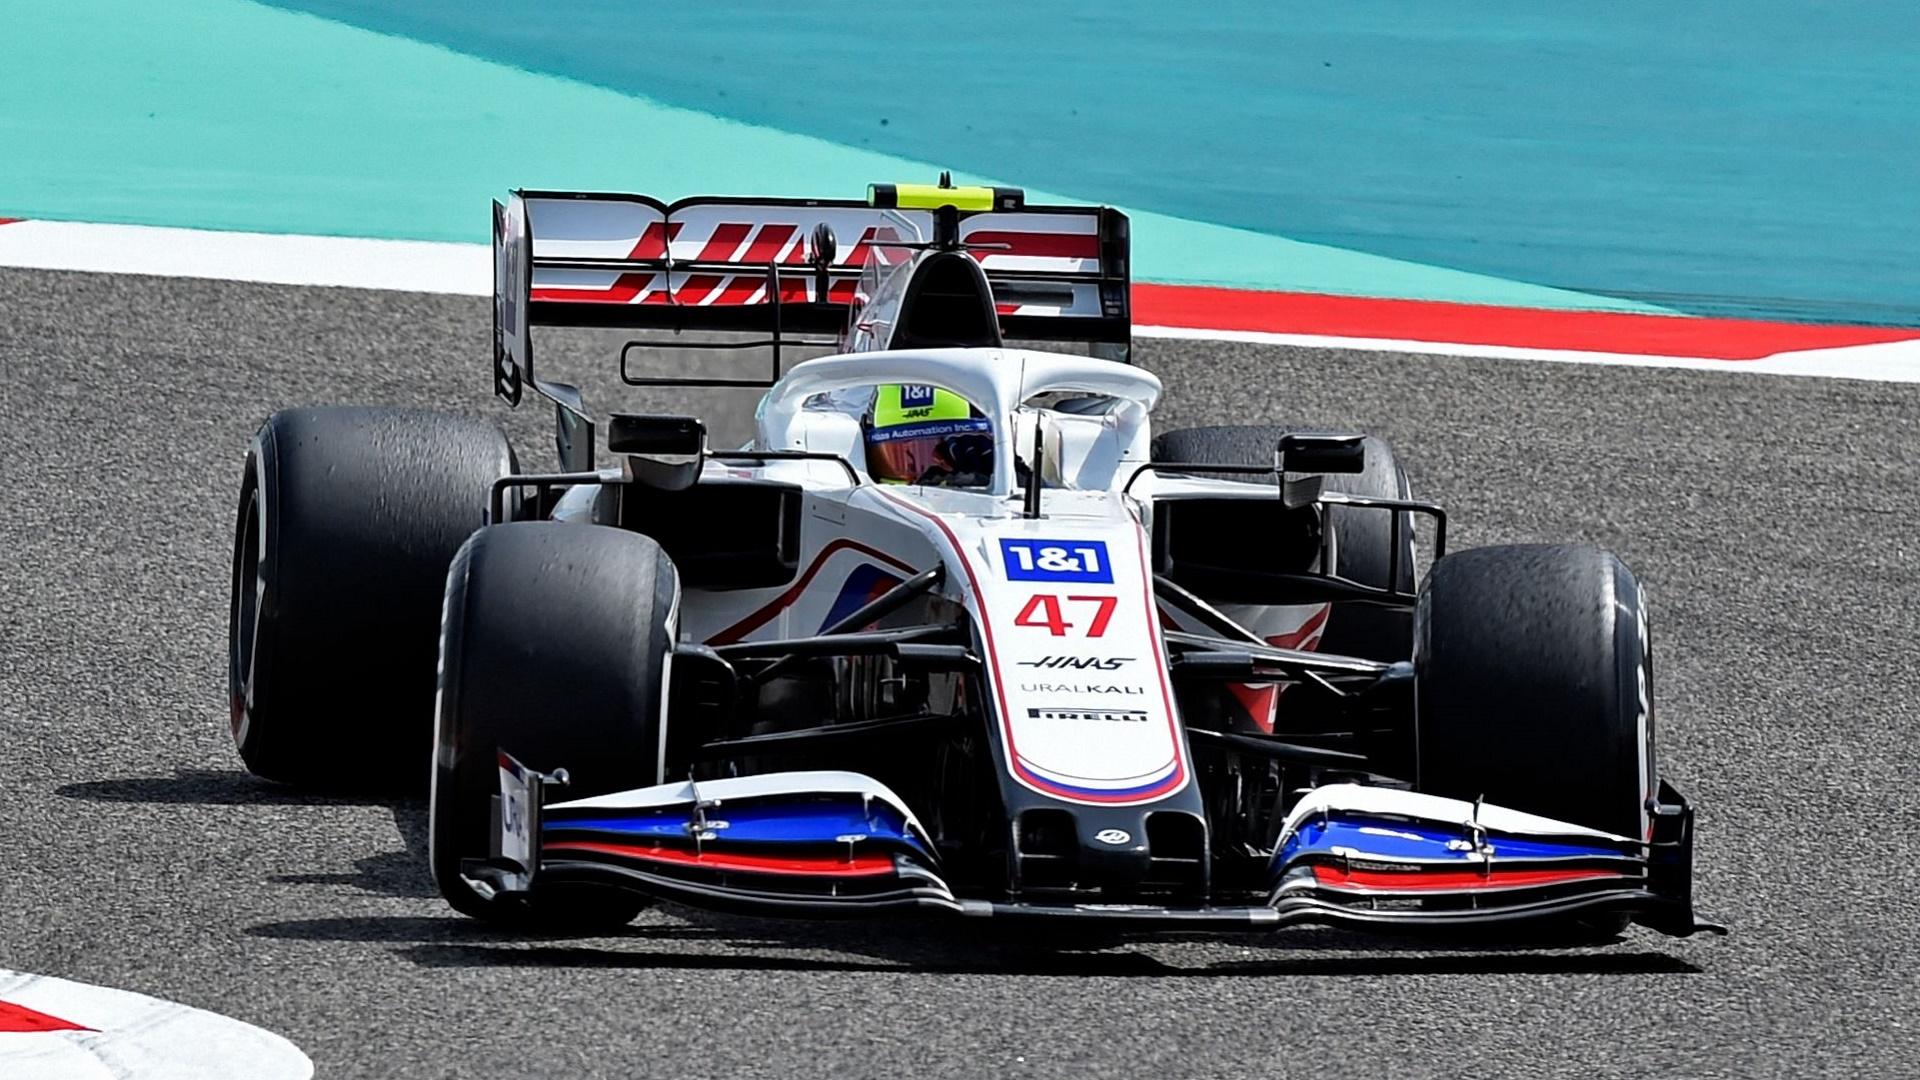 2021-03-12 Schumacher Haas F1 Formula 1